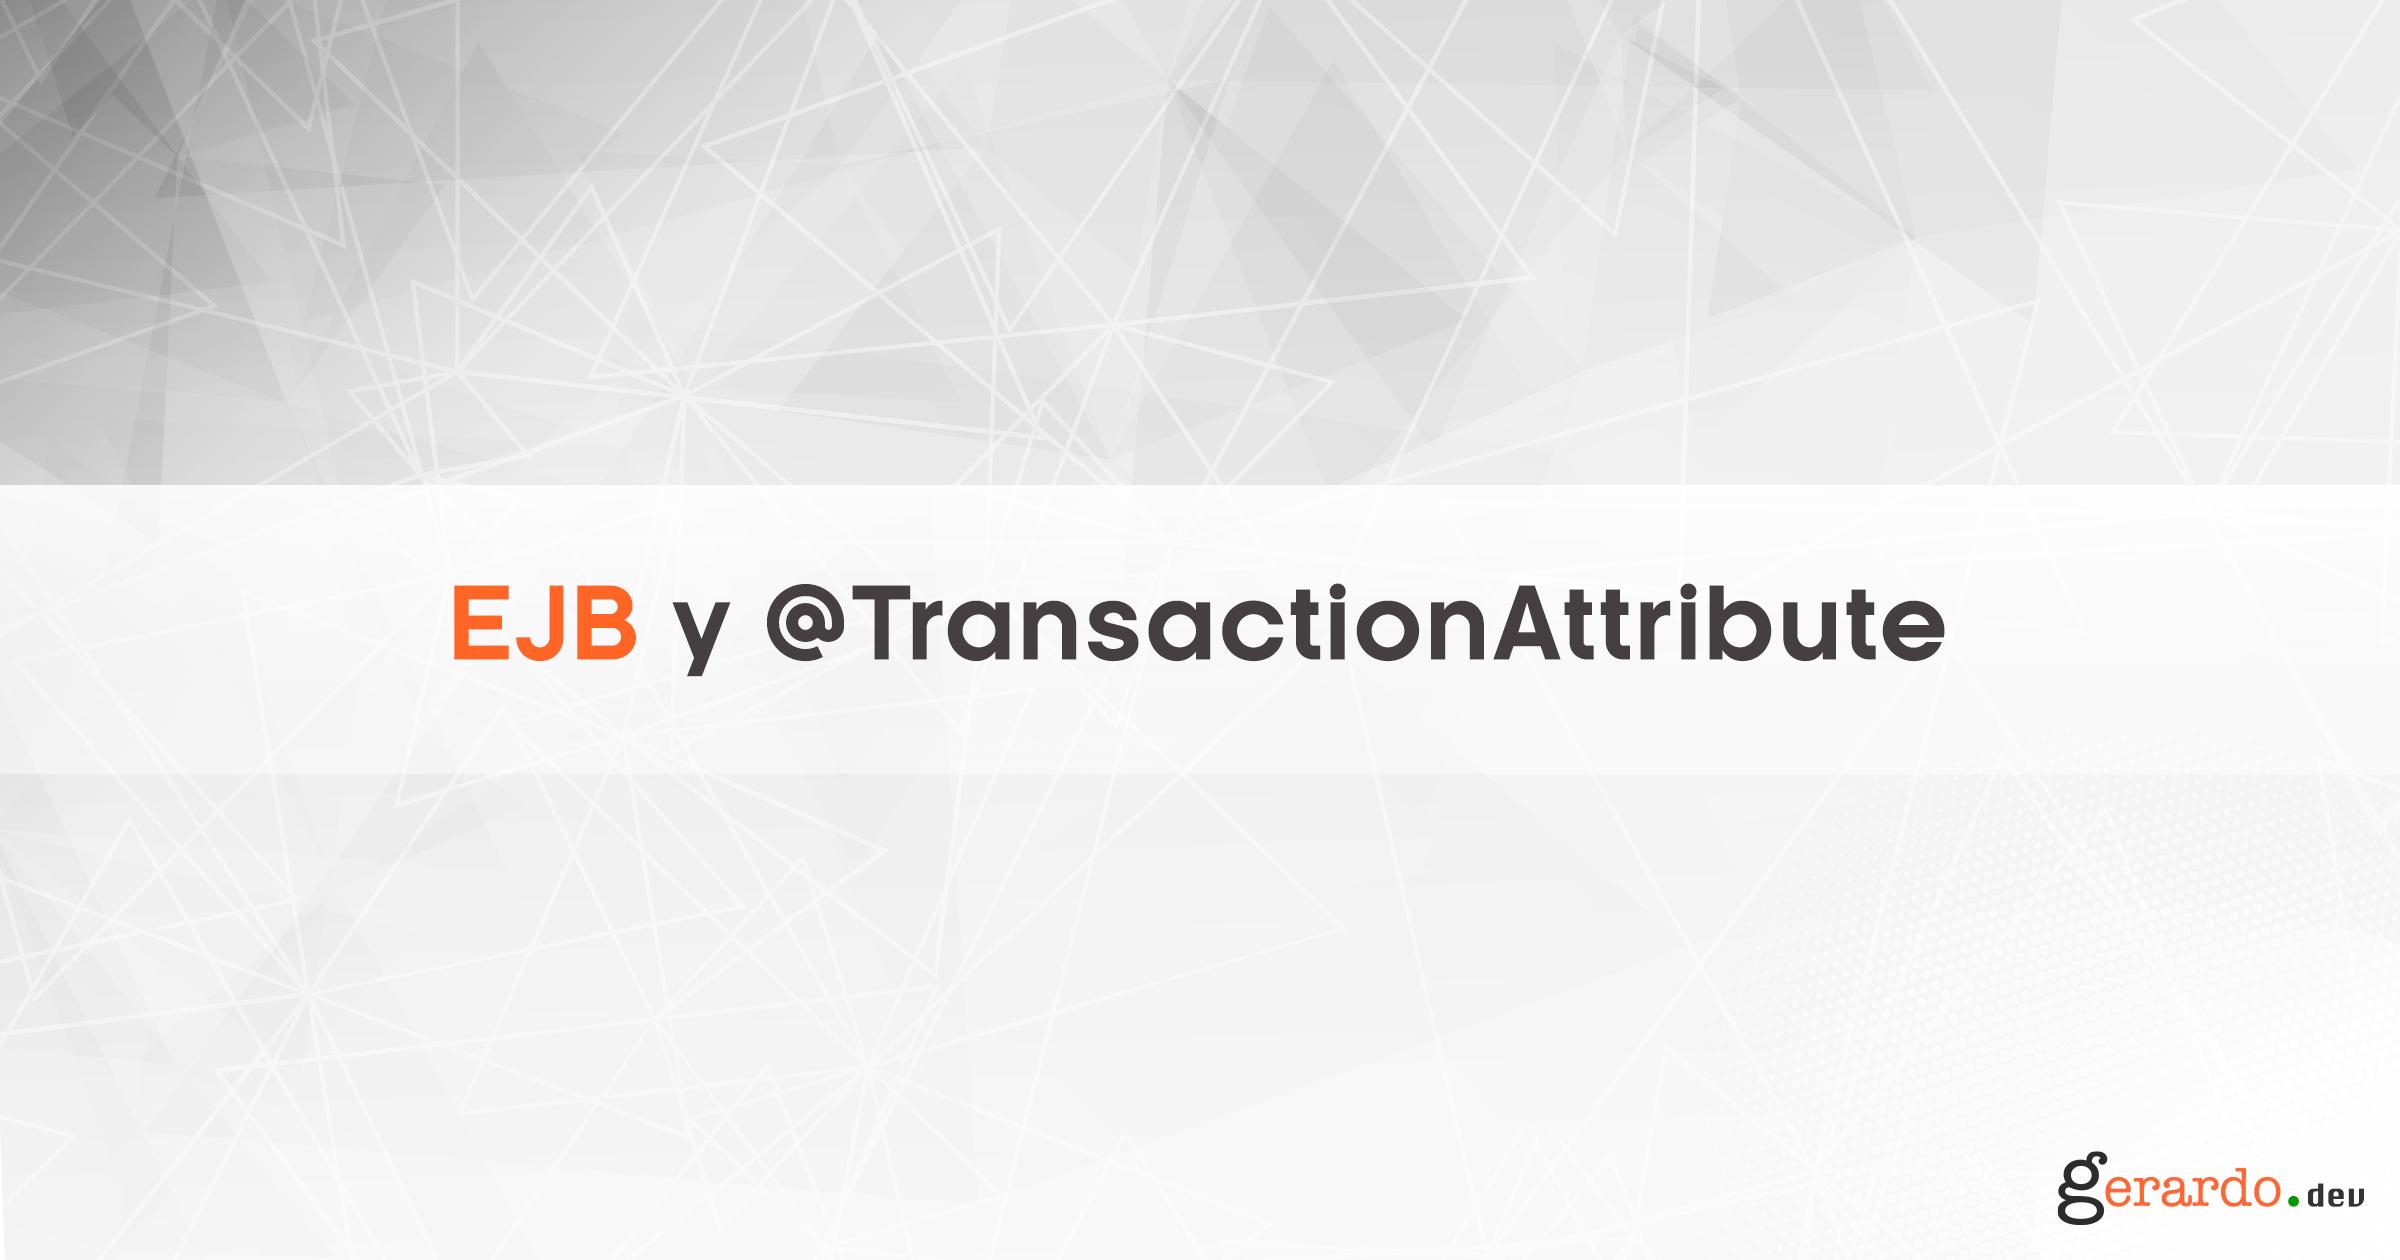 EJB y @TransactionAttribute